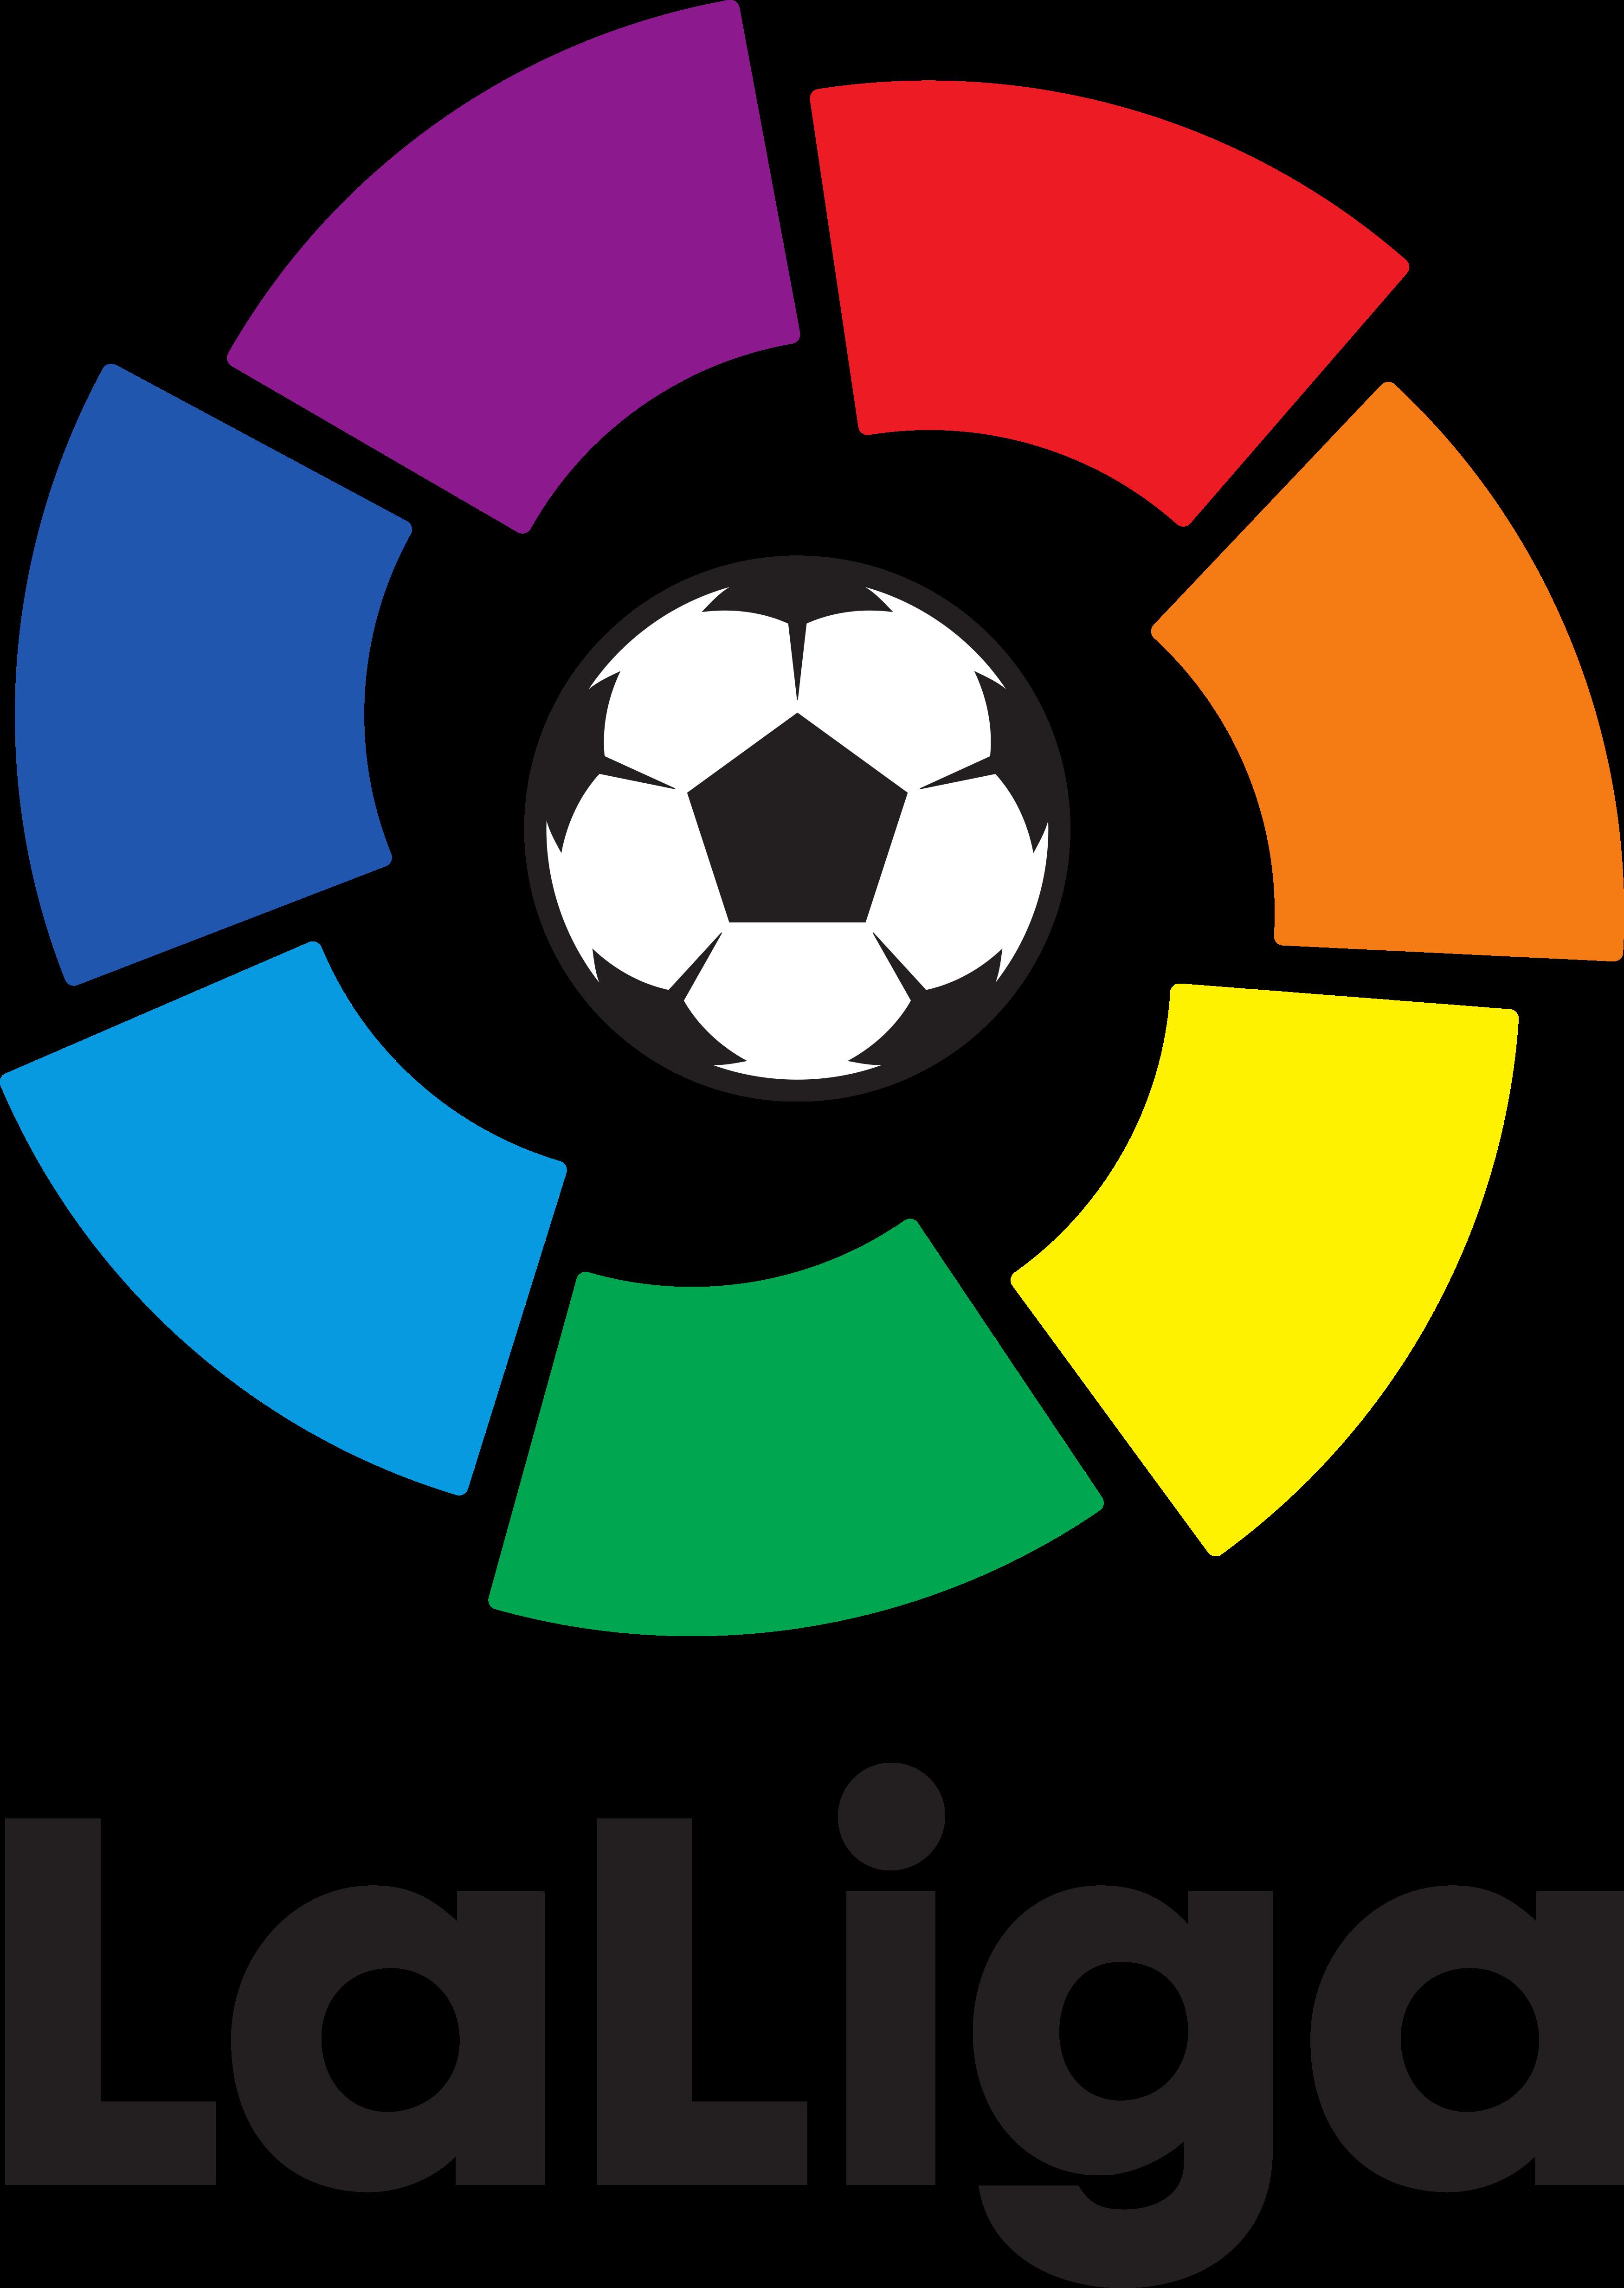 laliga logo - LaLiga Logo – Campeonato Español de Fútbol